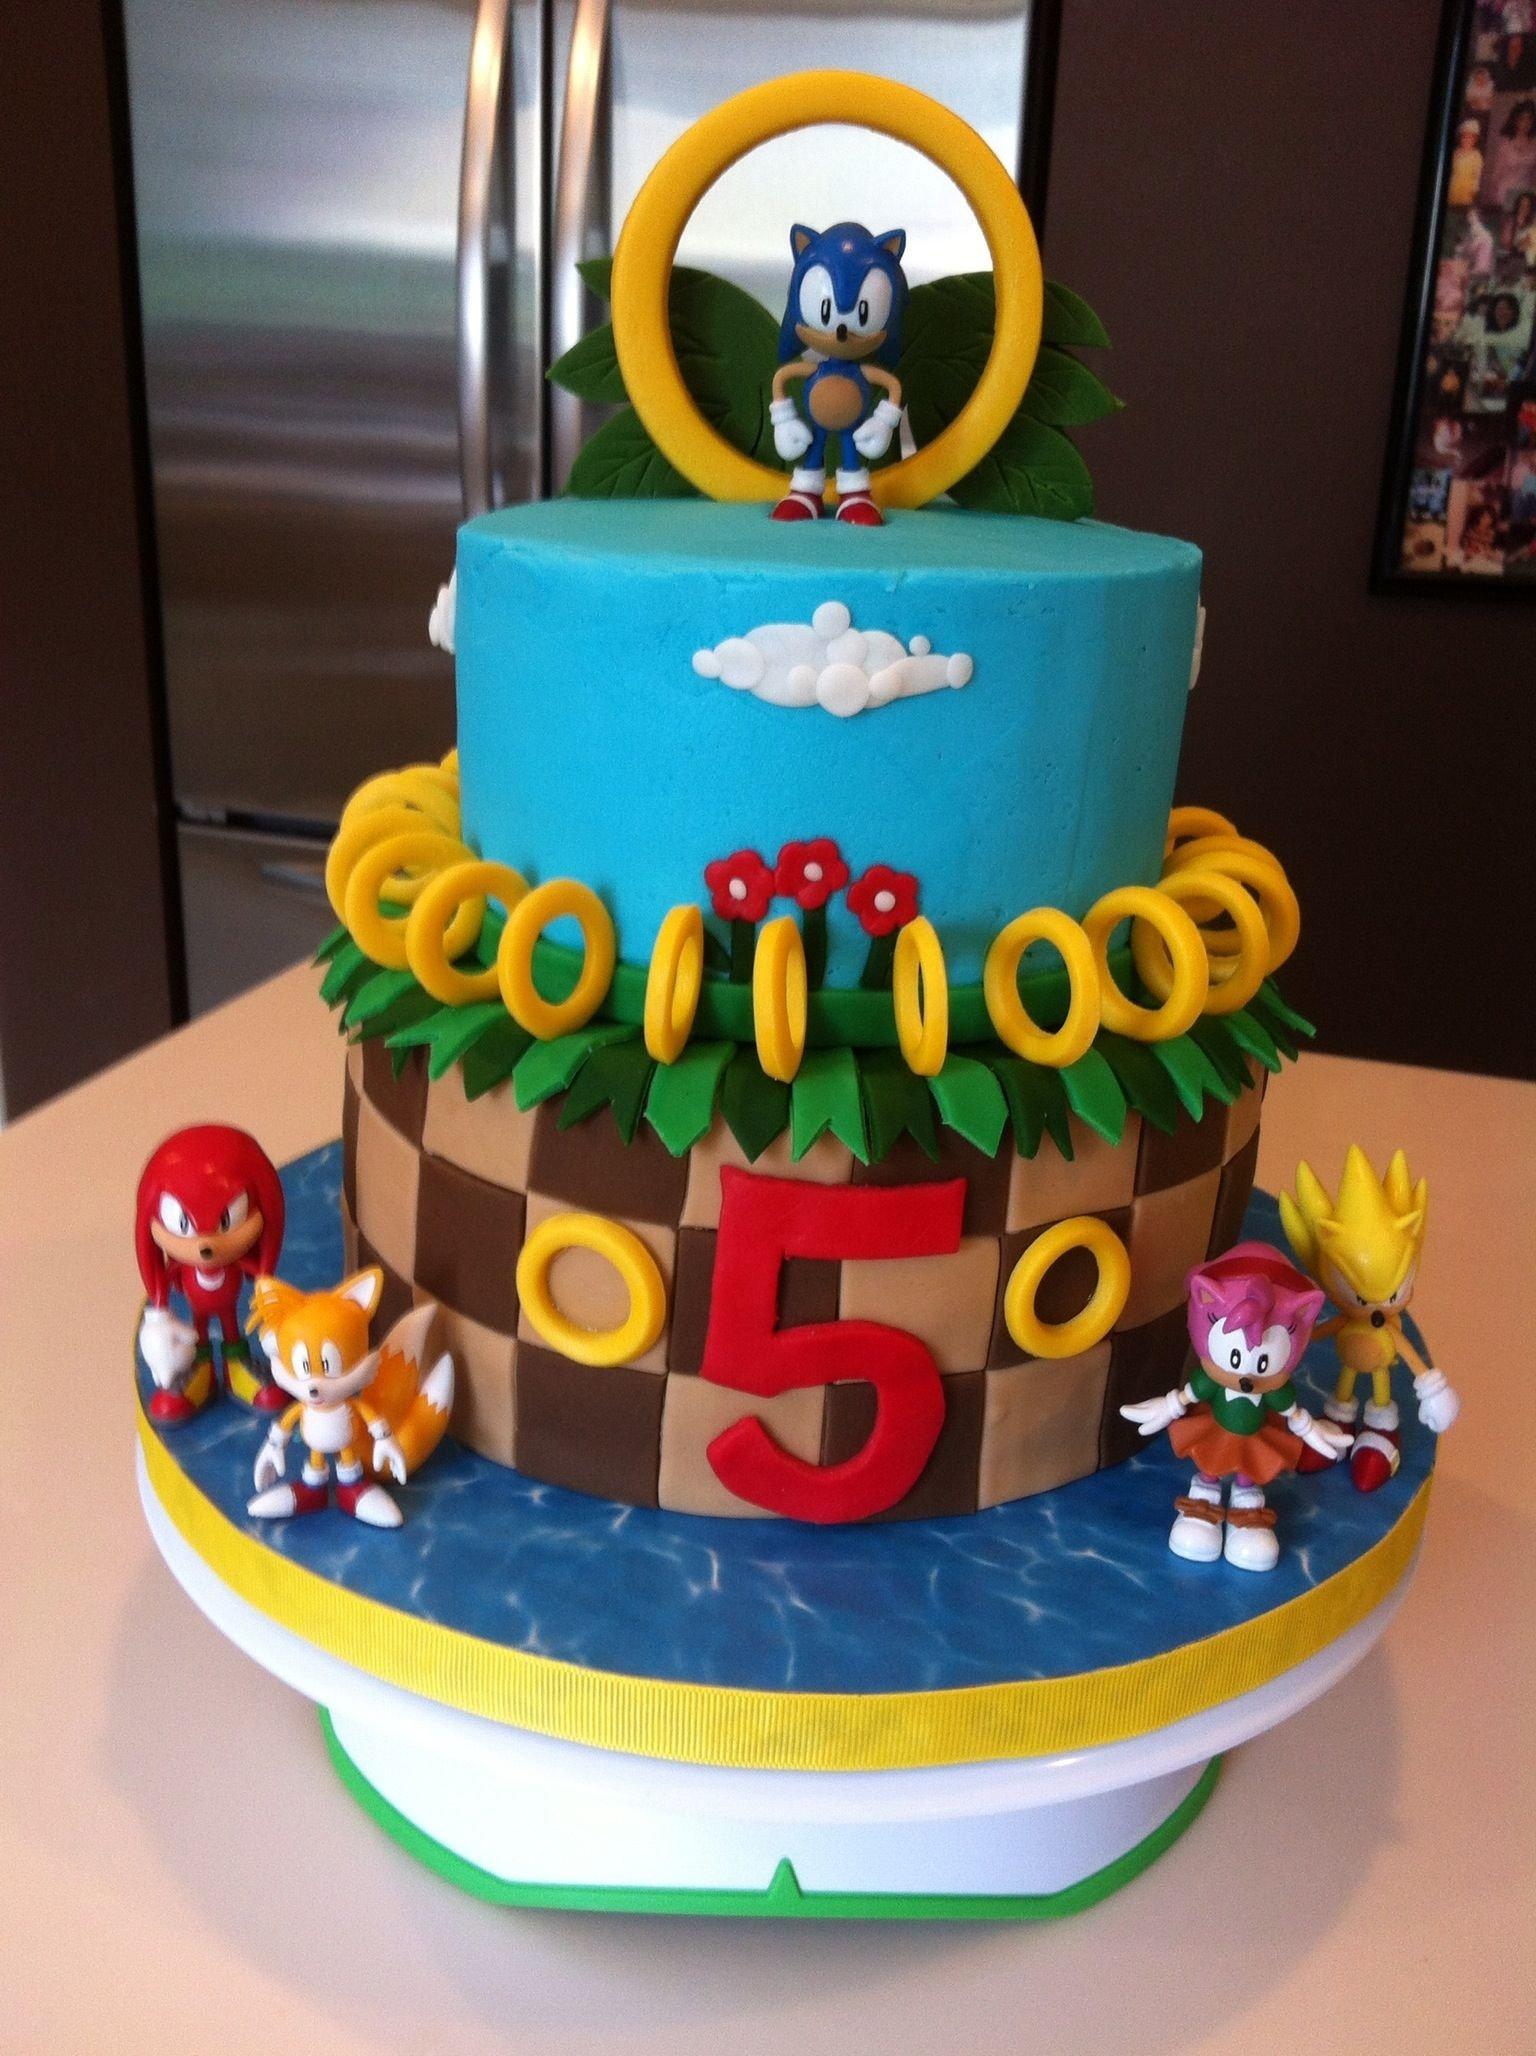 10 Nice Sonic The Hedgehog Party Ideas josh wants a sonic the hedgehog cake suzanne grimes party ideas 2021